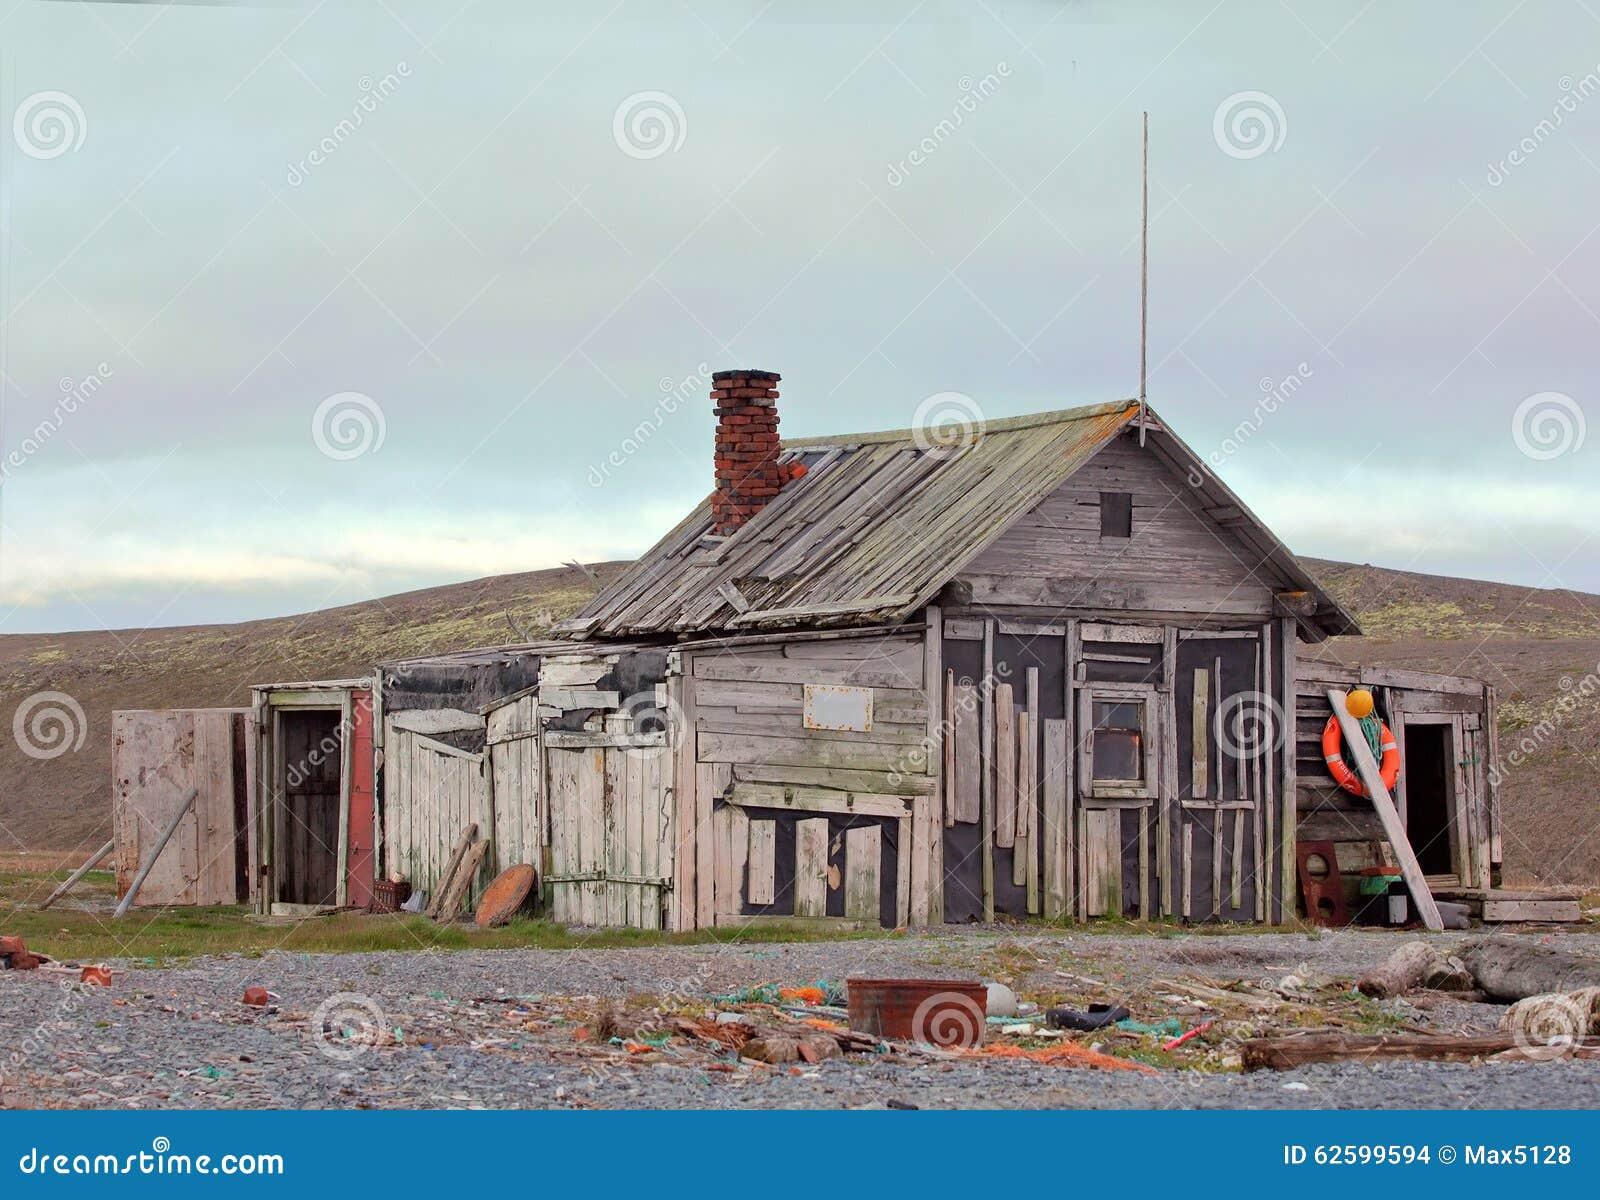 rough moclips upper rental ocean shores cabins cabin at